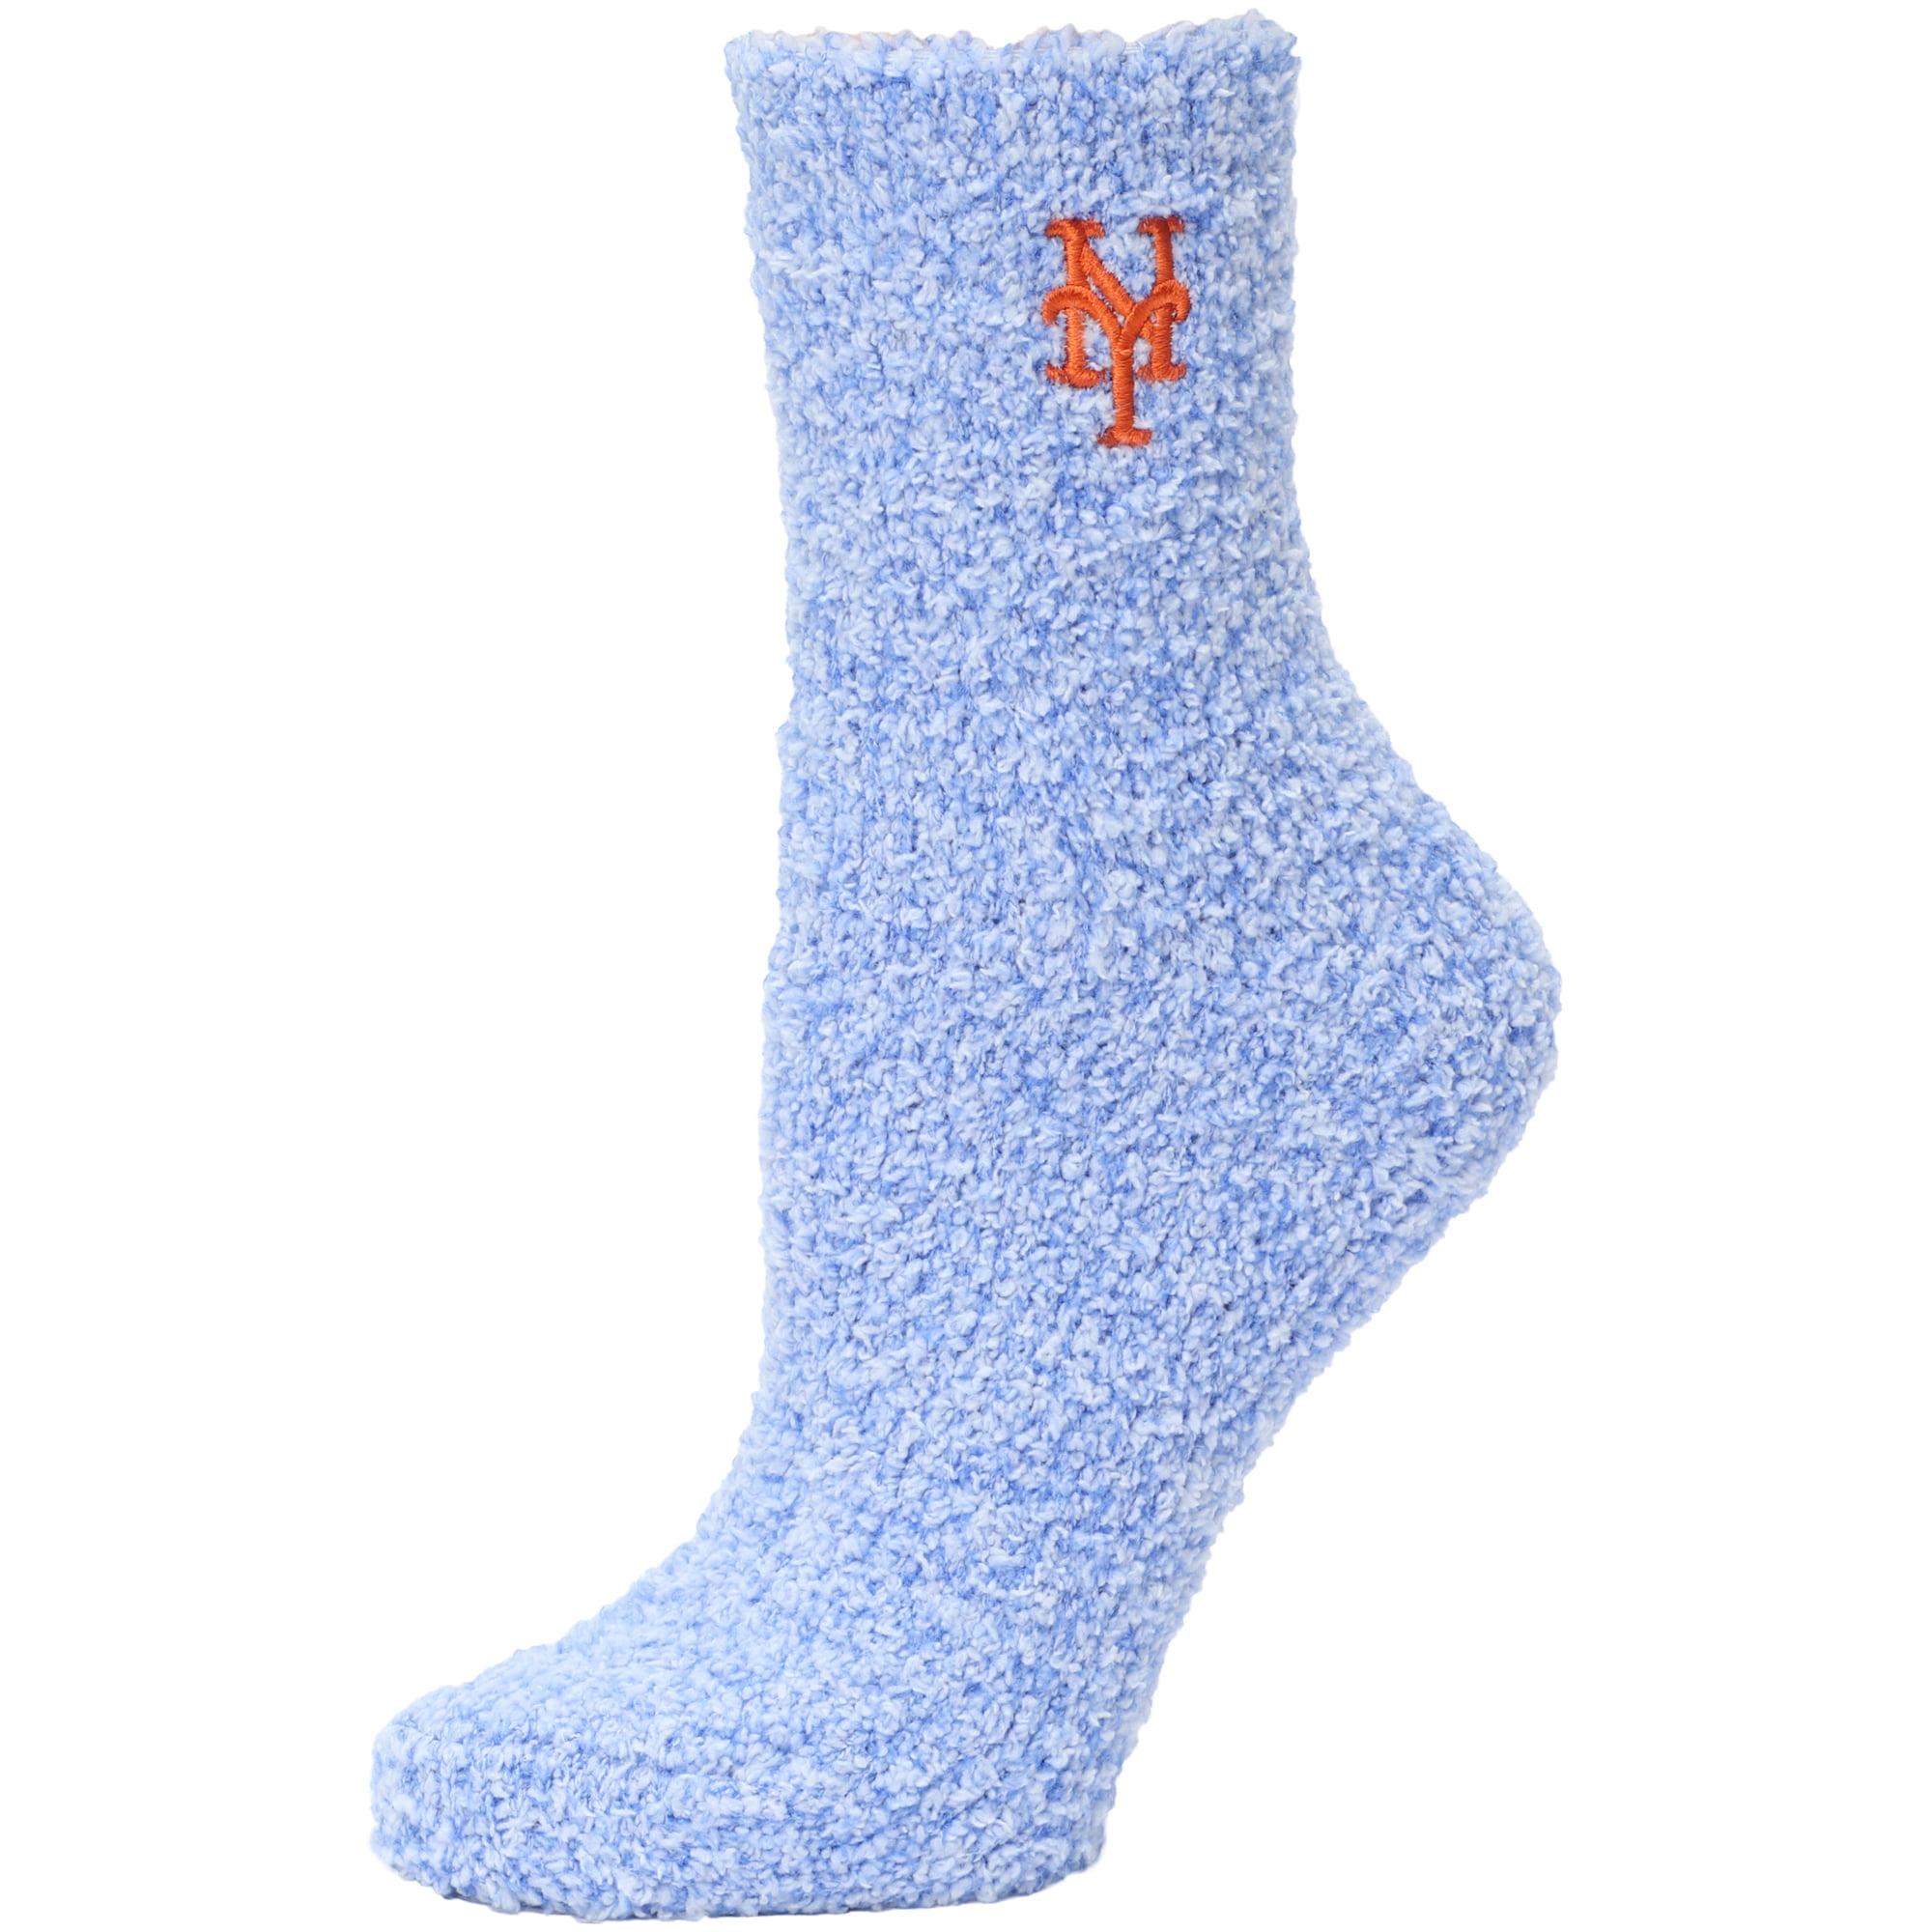 New York Mets Women's Fuzzy Block Tri-Blend Socks - Royal - M